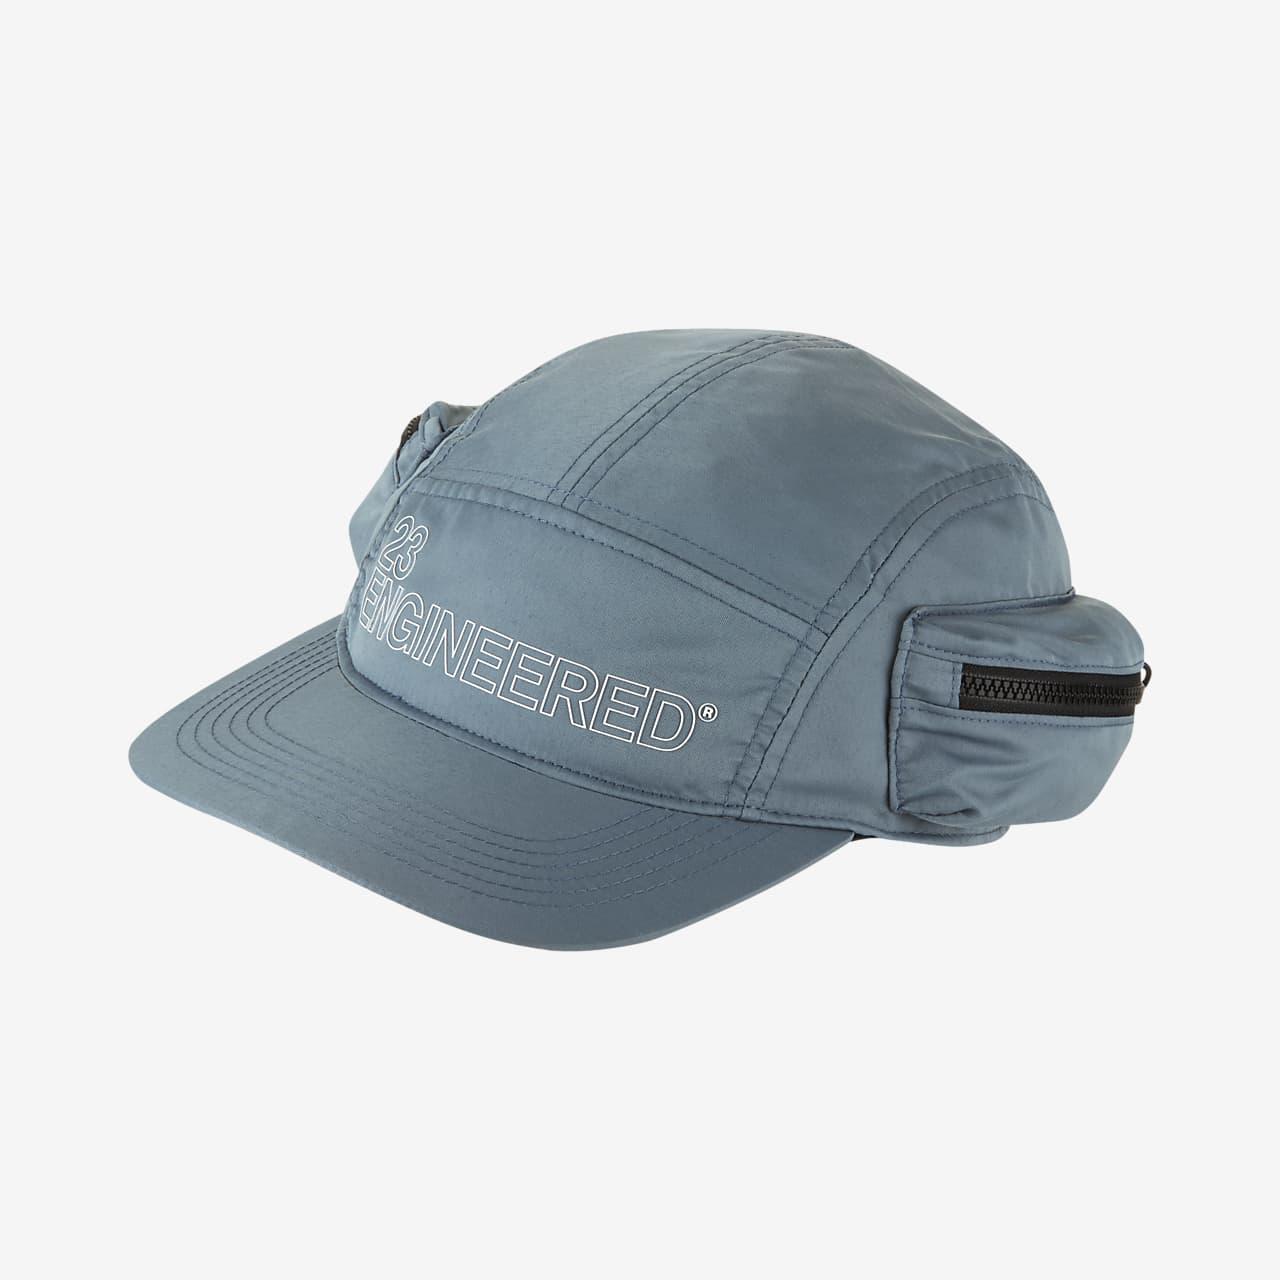 Jordan 23 Engineered AW84 Pocket Cap